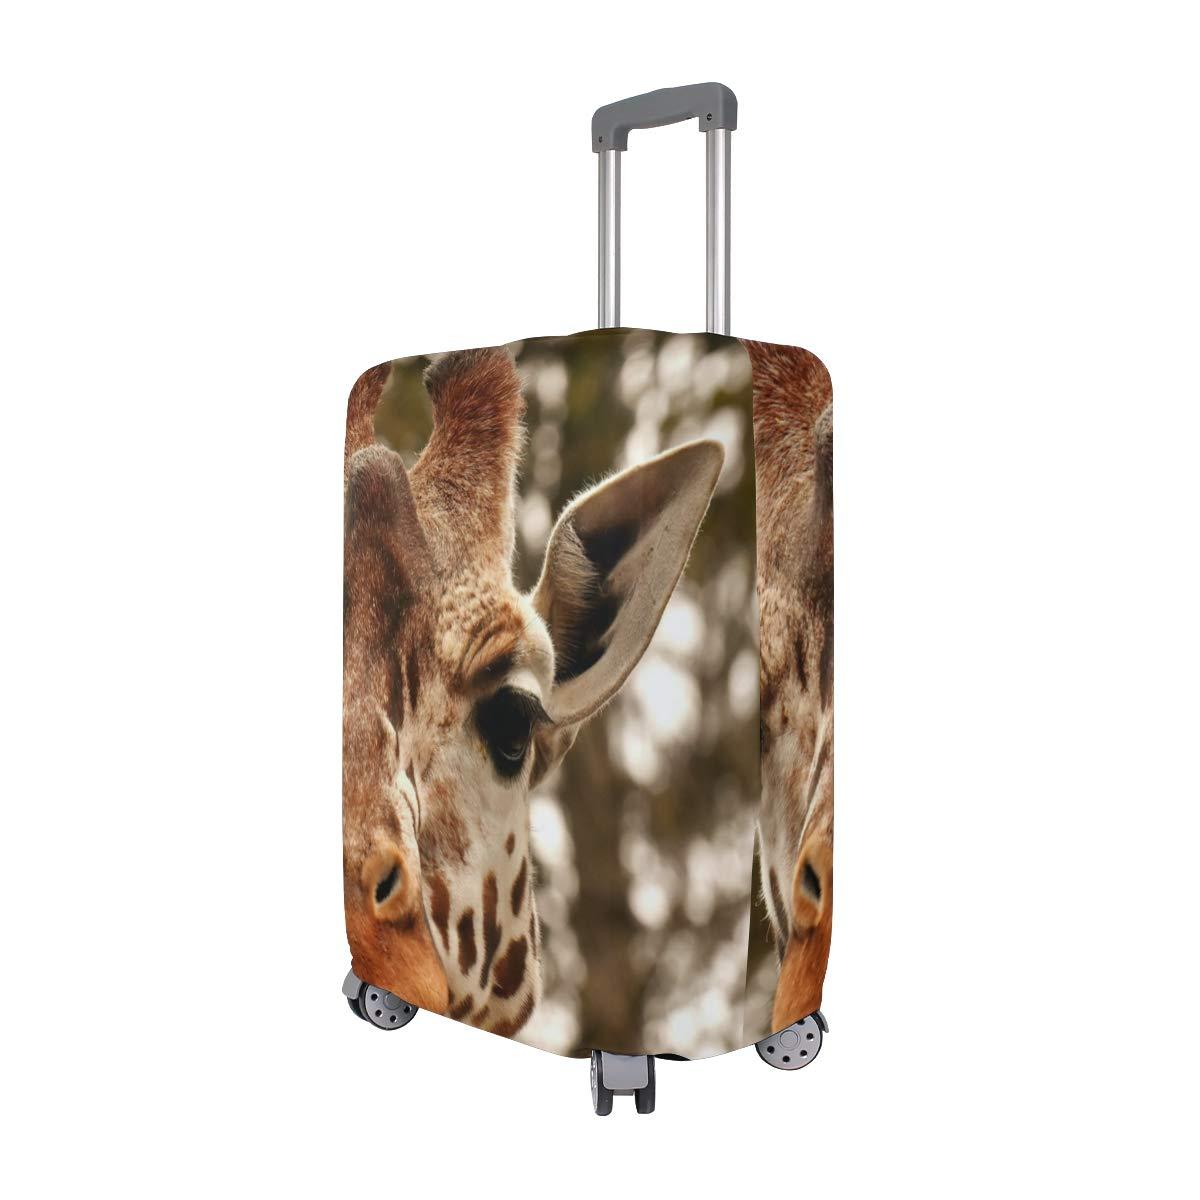 Travel Luggage Cover Wild Zoo Giraffe Head Suitcase Protector